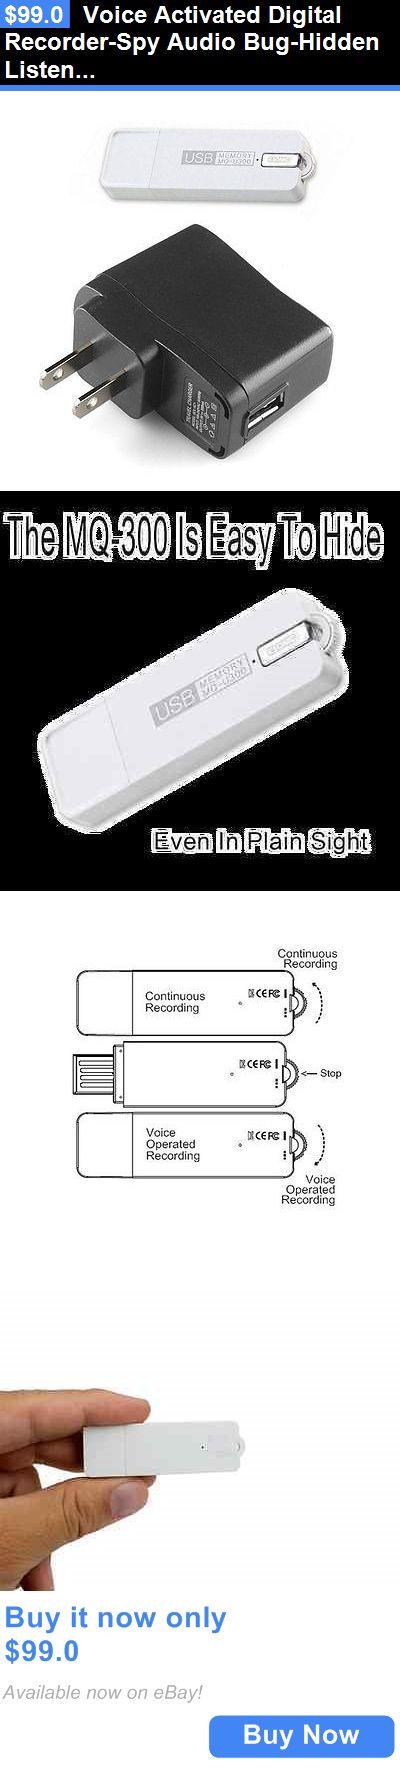 Voice Recorders Dictaphones: Voice Activated Digital Recorder-Spy Audio Bug-Hidden Listening Device Mq-U300 BUY IT NOW ONLY: $99.0